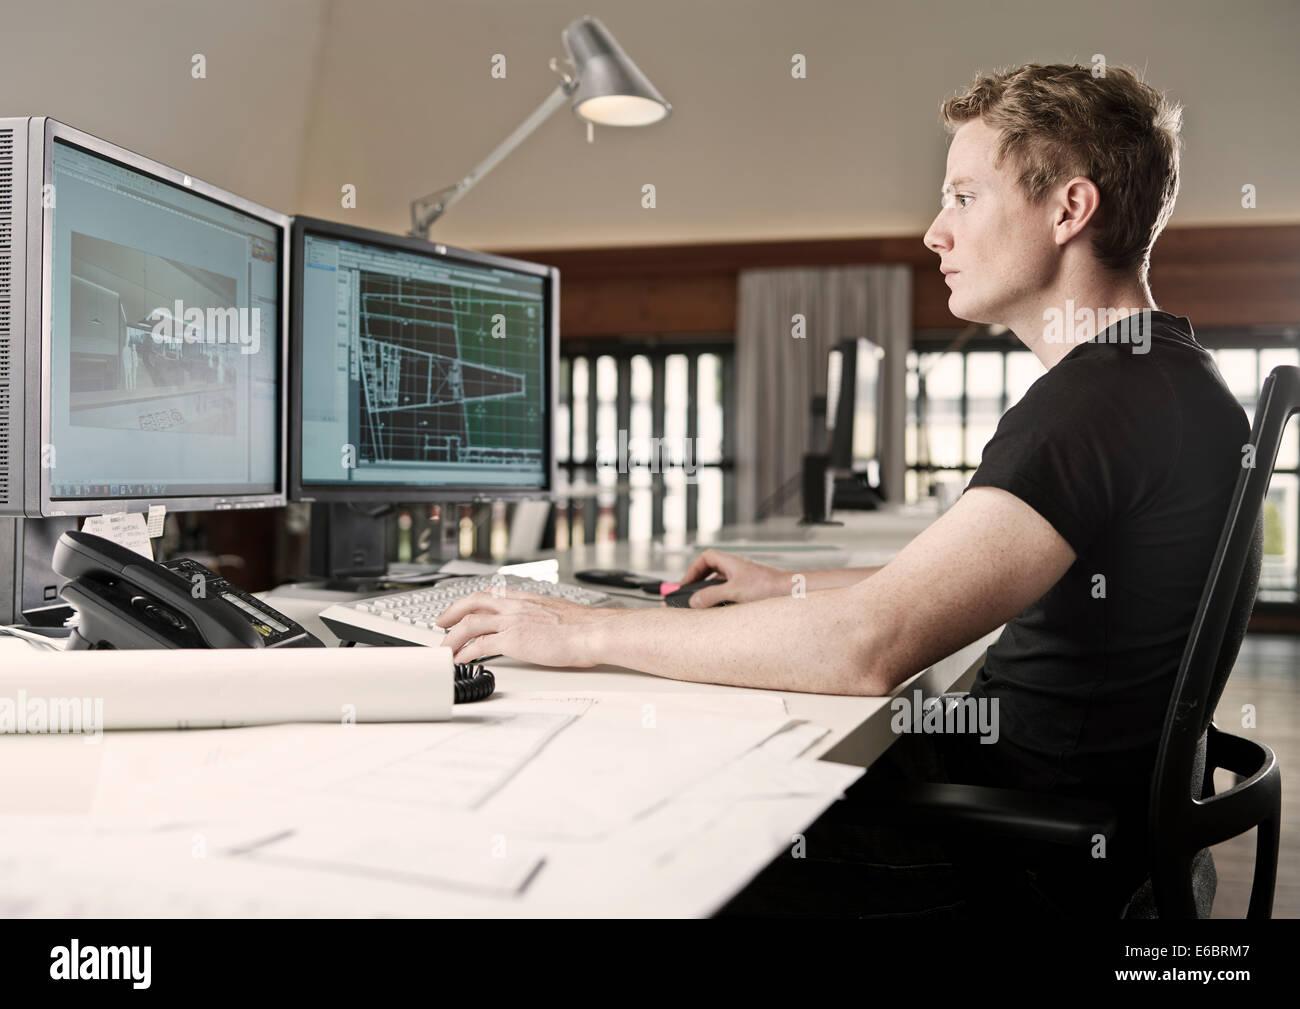 Architect planning on a computer, Innsbruck, Tyrol, Austria - Stock Image